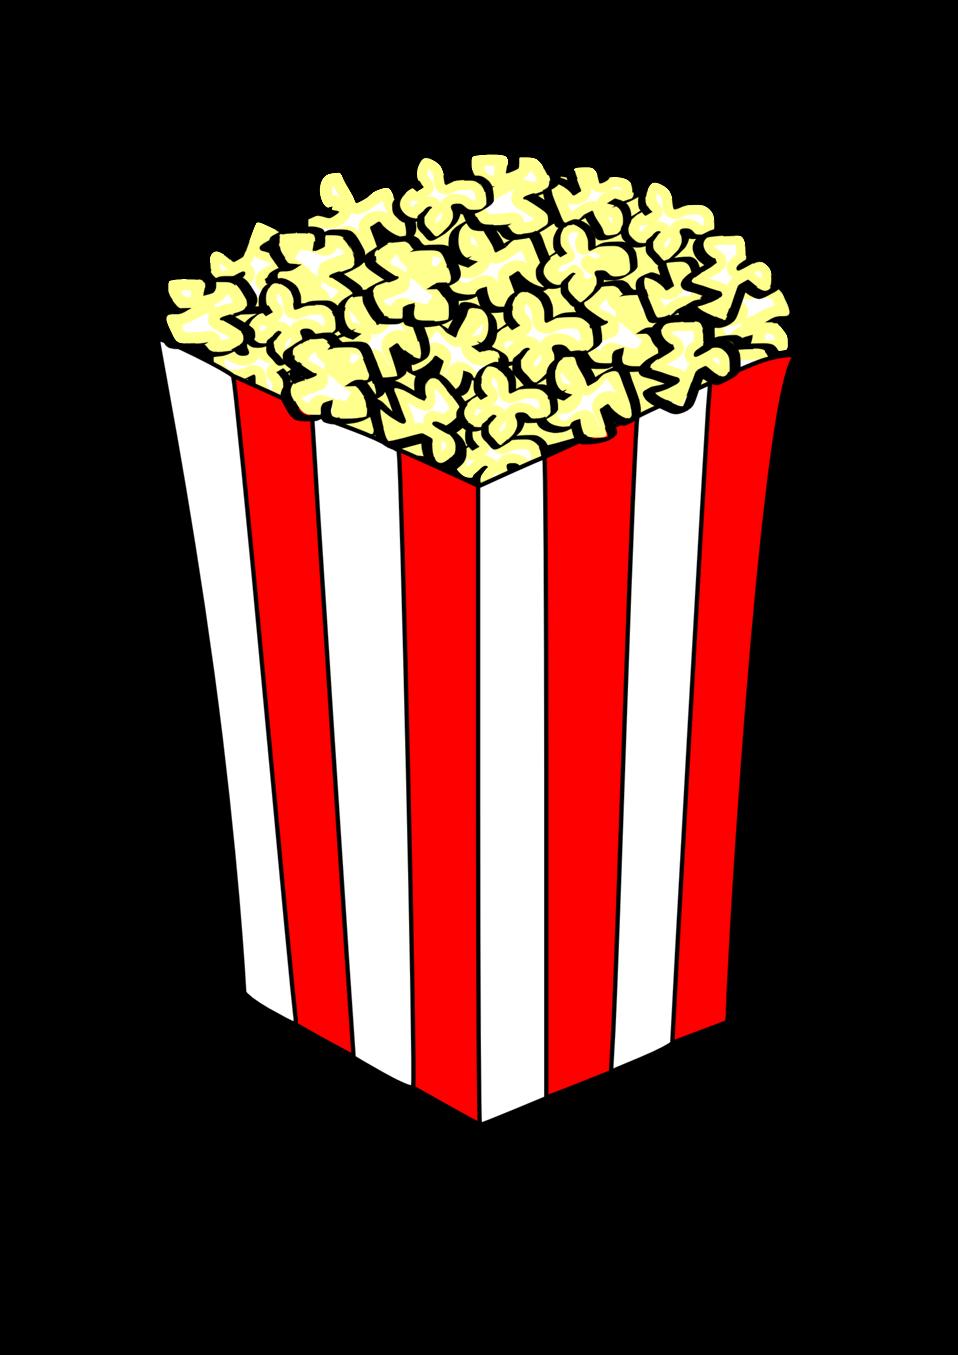 Public Domain Clip Art Image   Popcorn   ID: 13937334013841   PublicDomainFiles.com